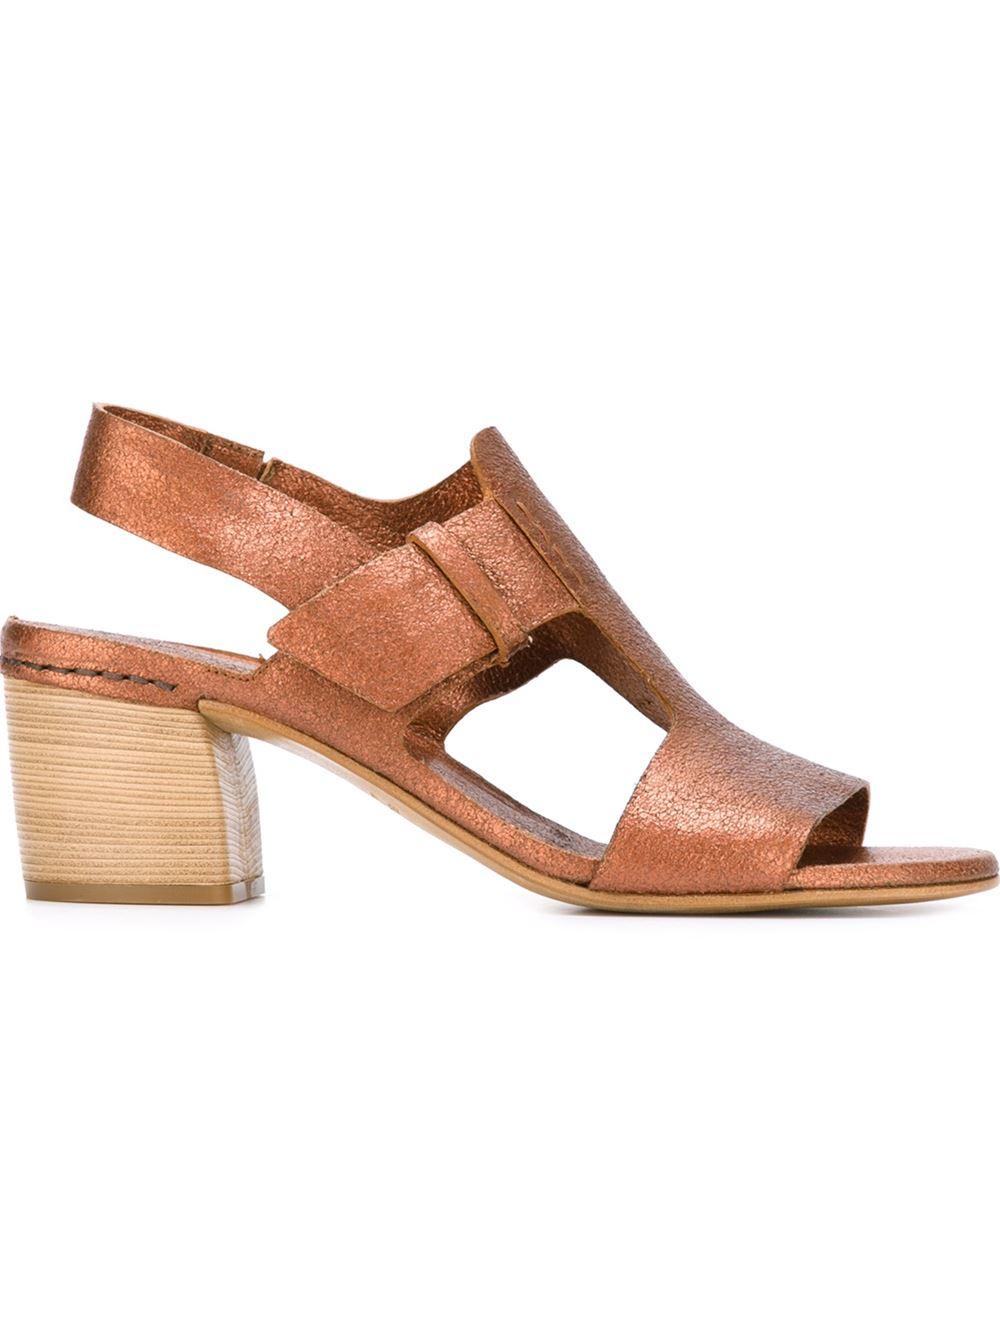 Roberto del carlo Chunky Heel Sandals in Natural